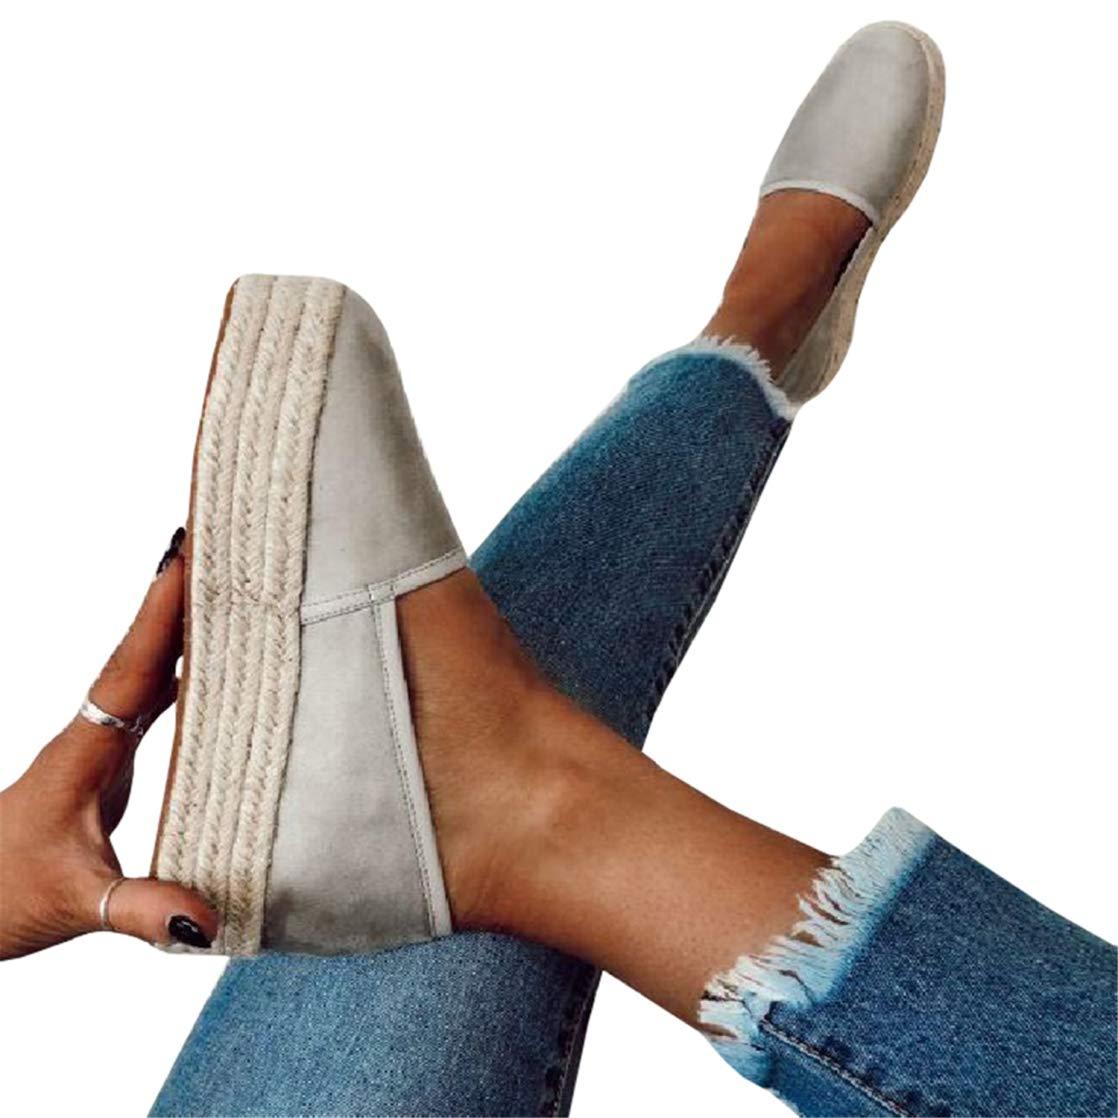 589aff40085e0 Womens Espadrille Flatform Loafers Slip on Platform Sneakers Low Top Flats  Shoes